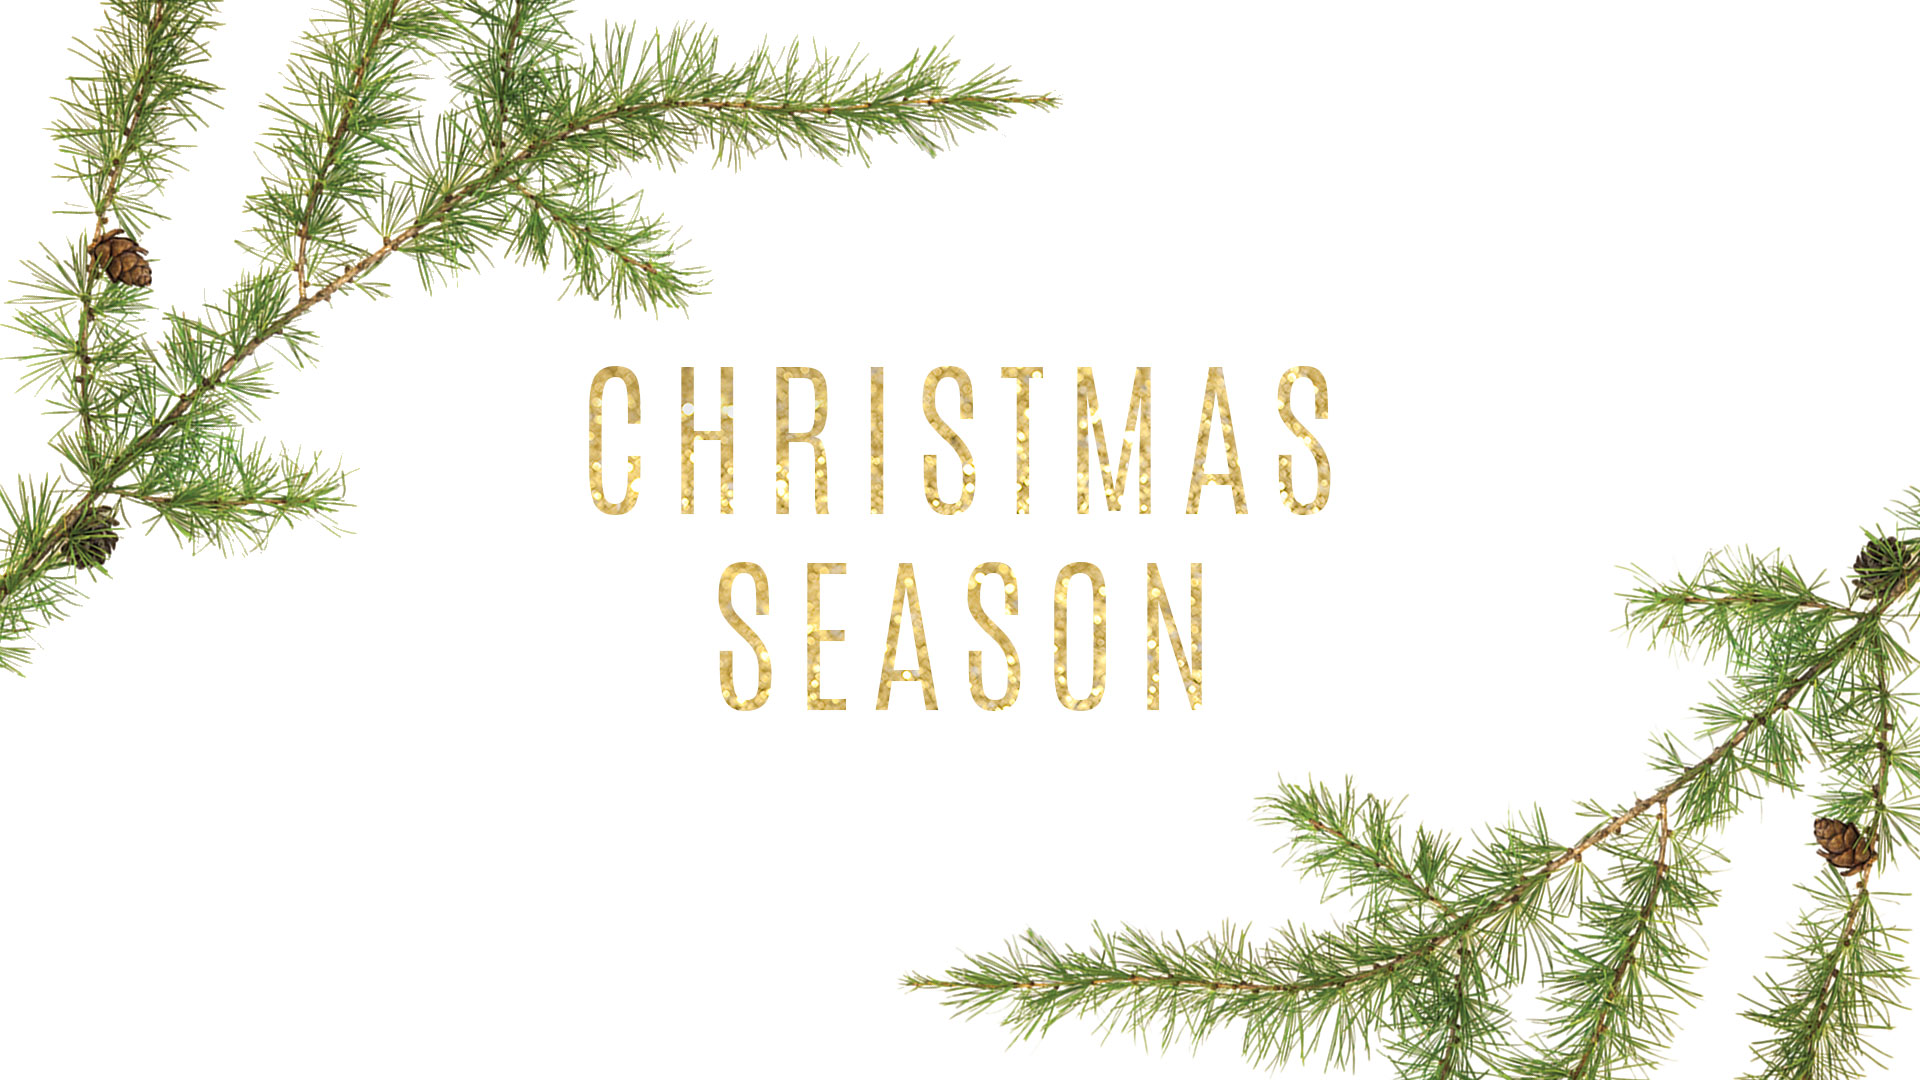 masthead: Christmas Season 2019